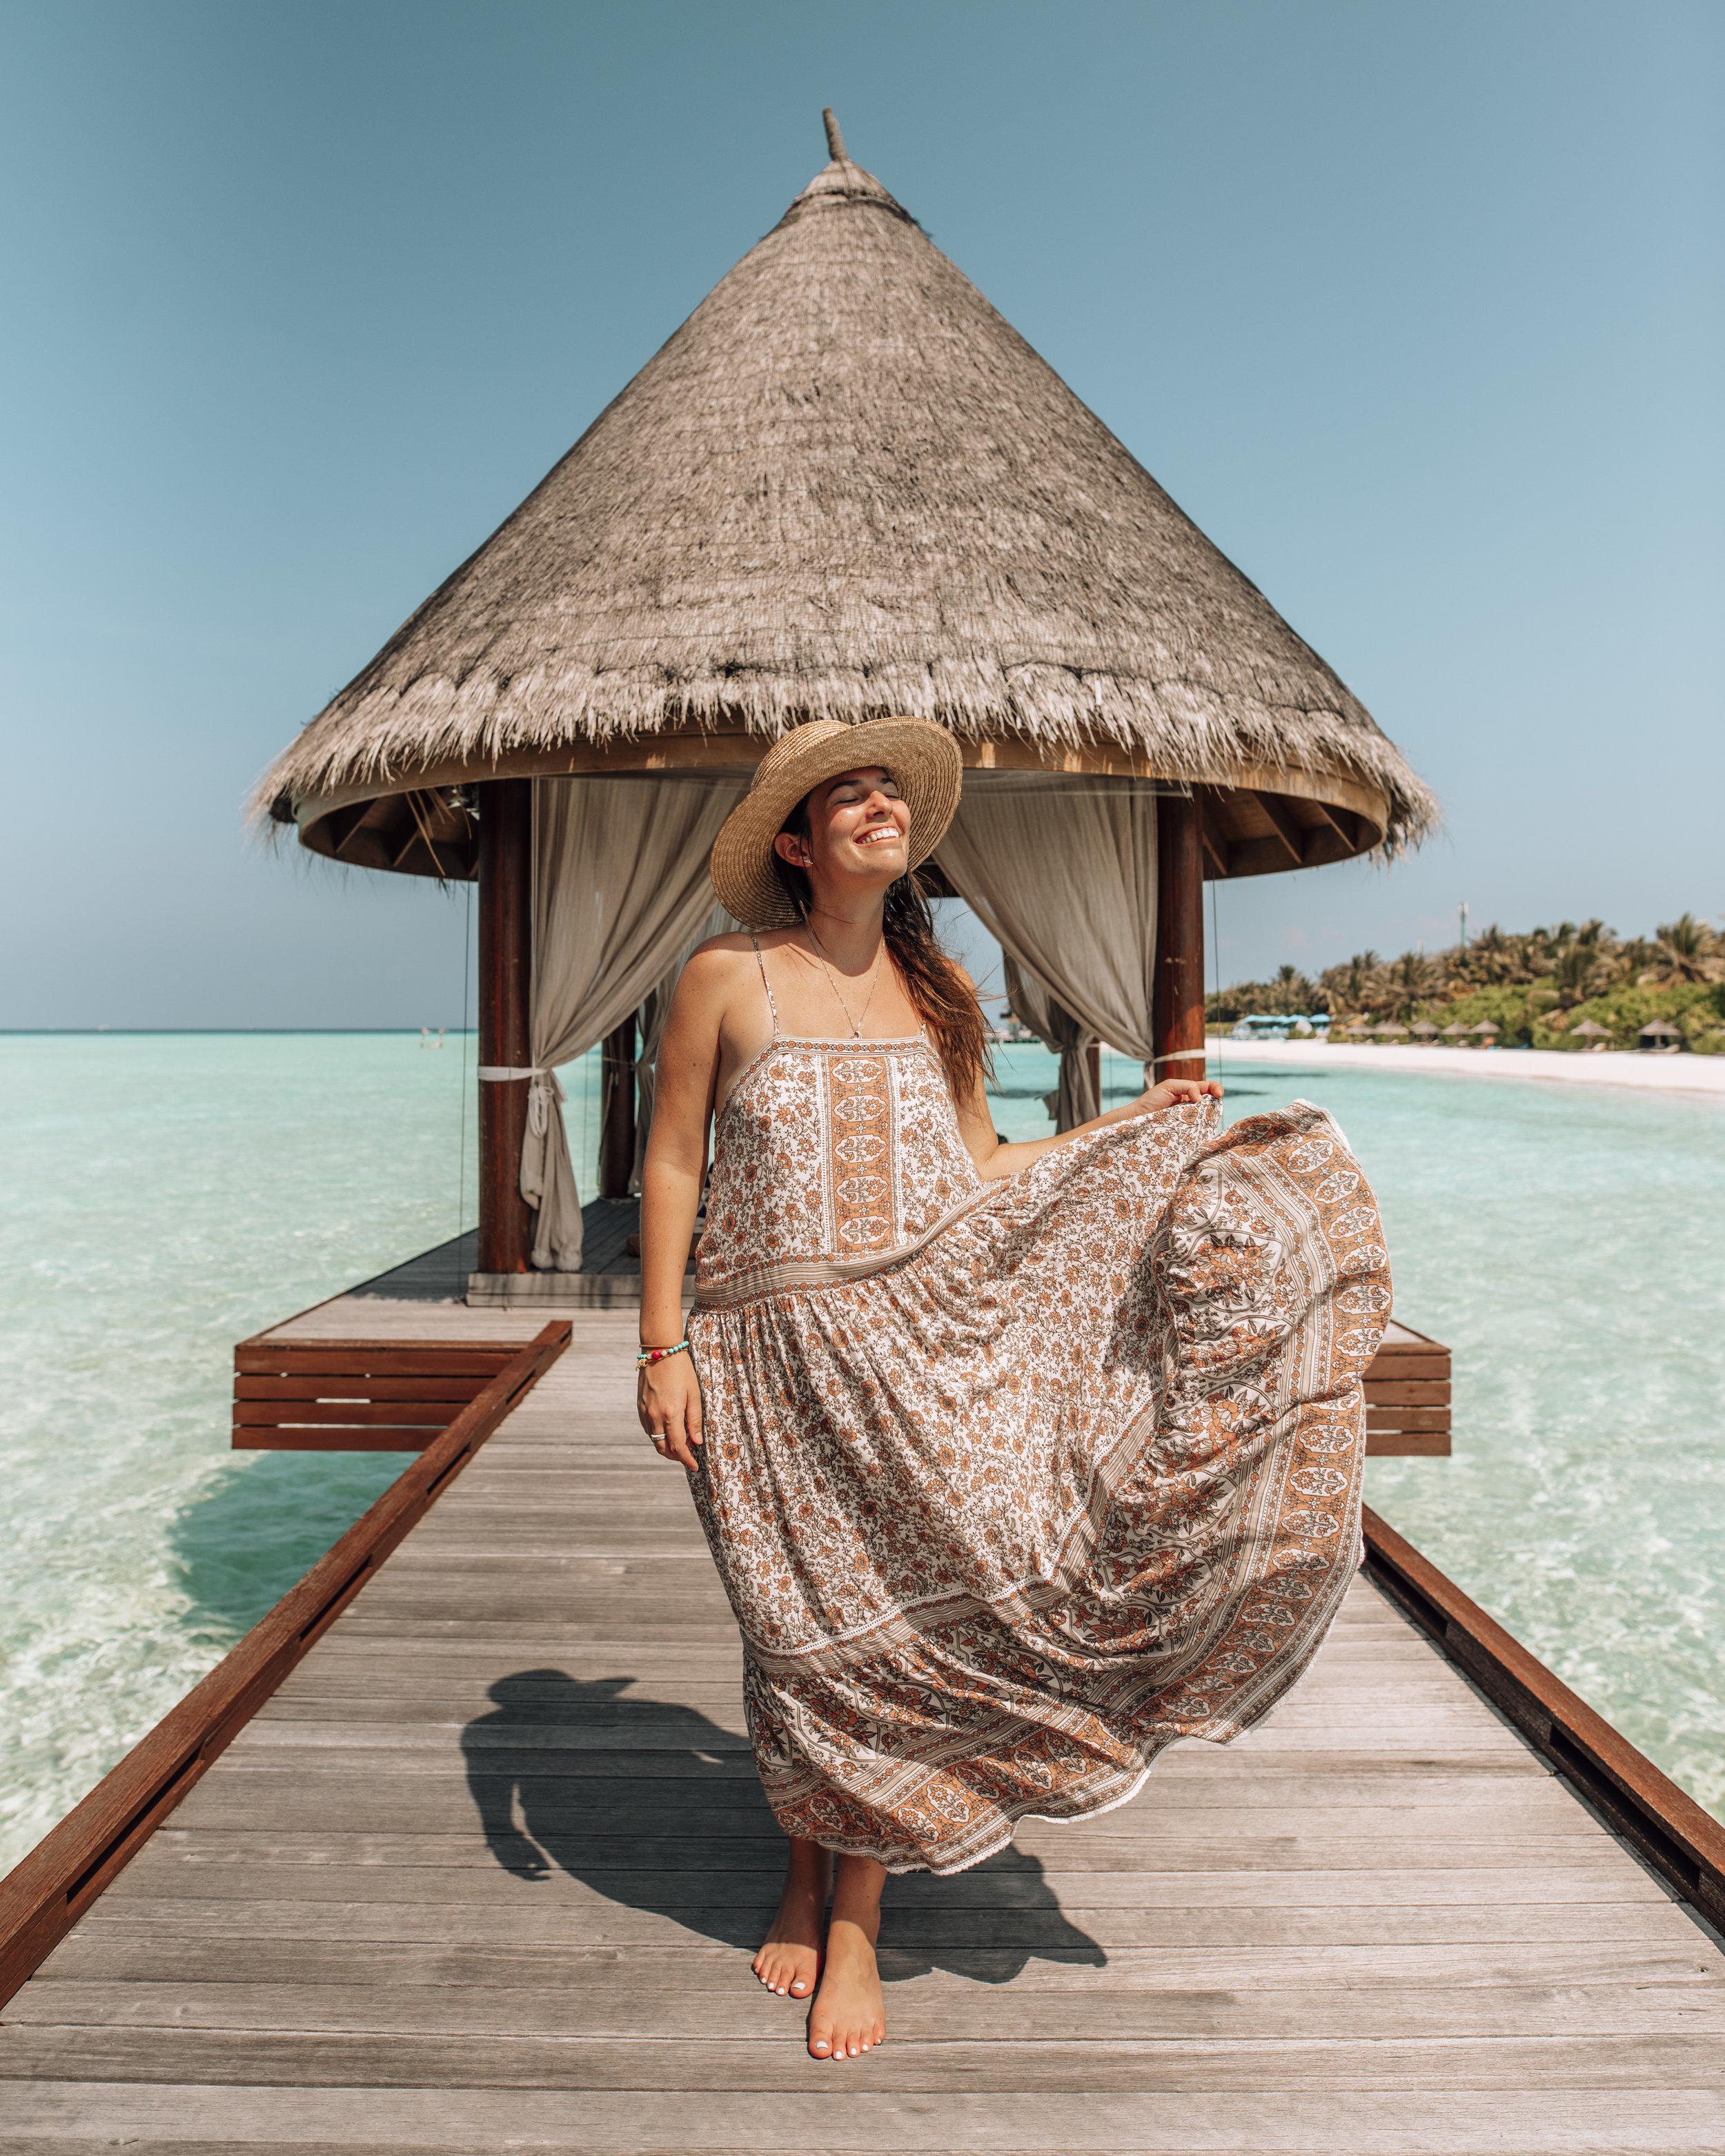 maldives-72.jpg